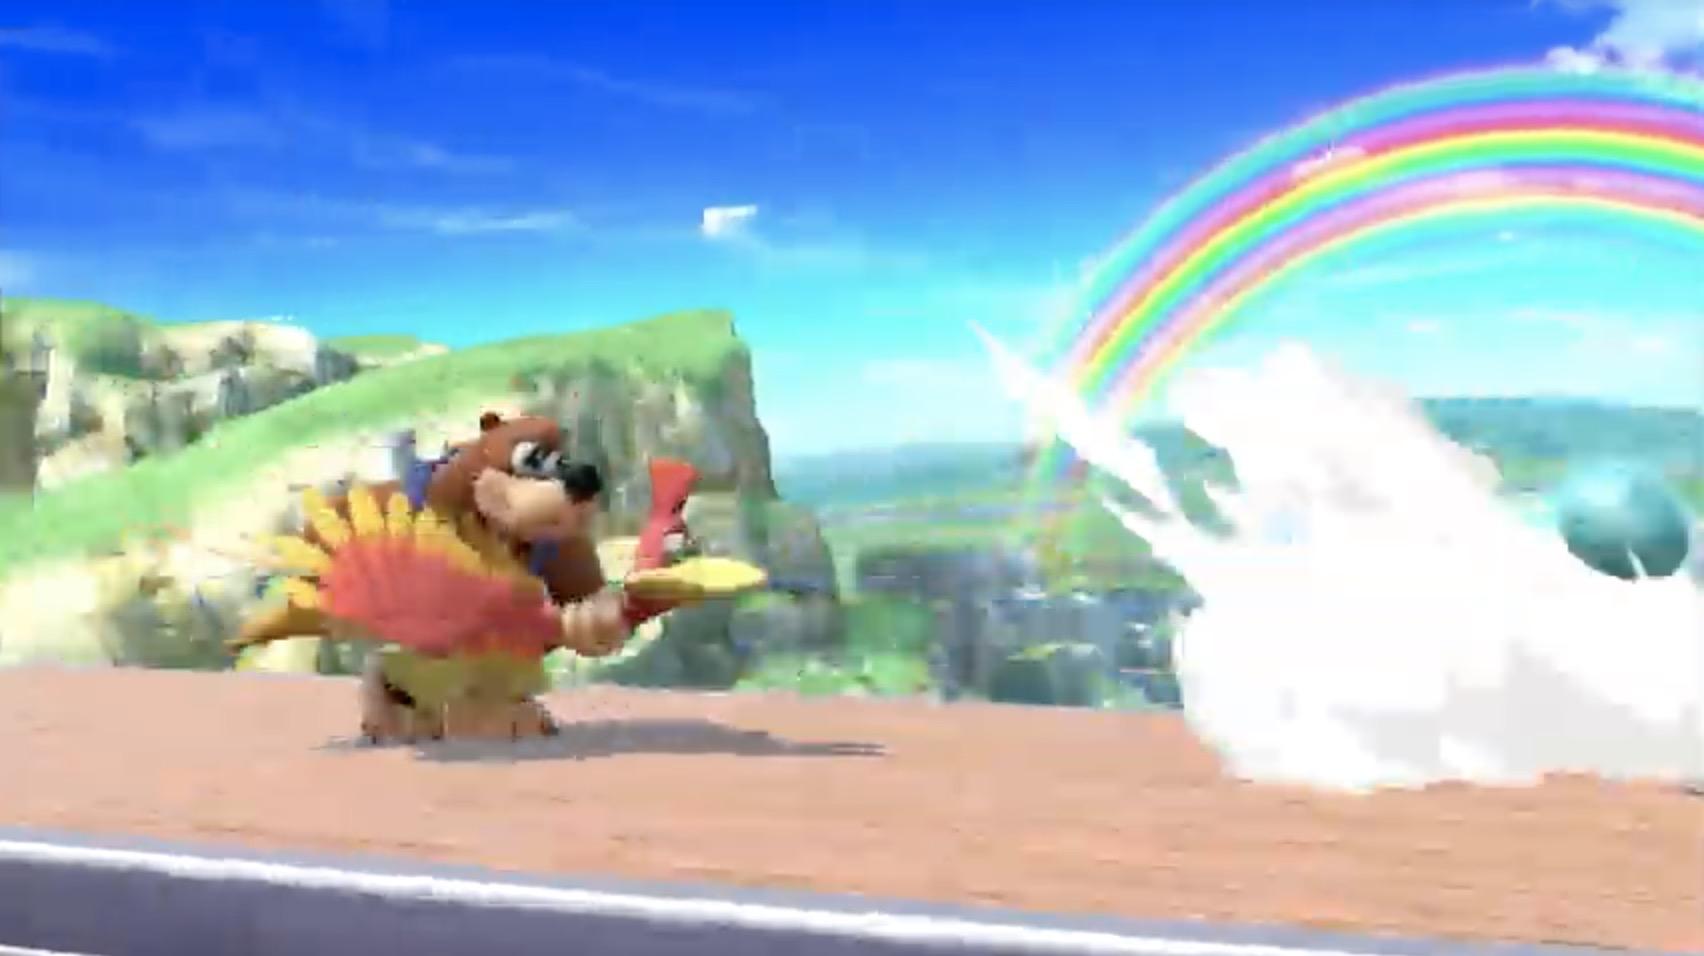 Banjo-Kazooie are coming to Super Smash Bros  Ultimate